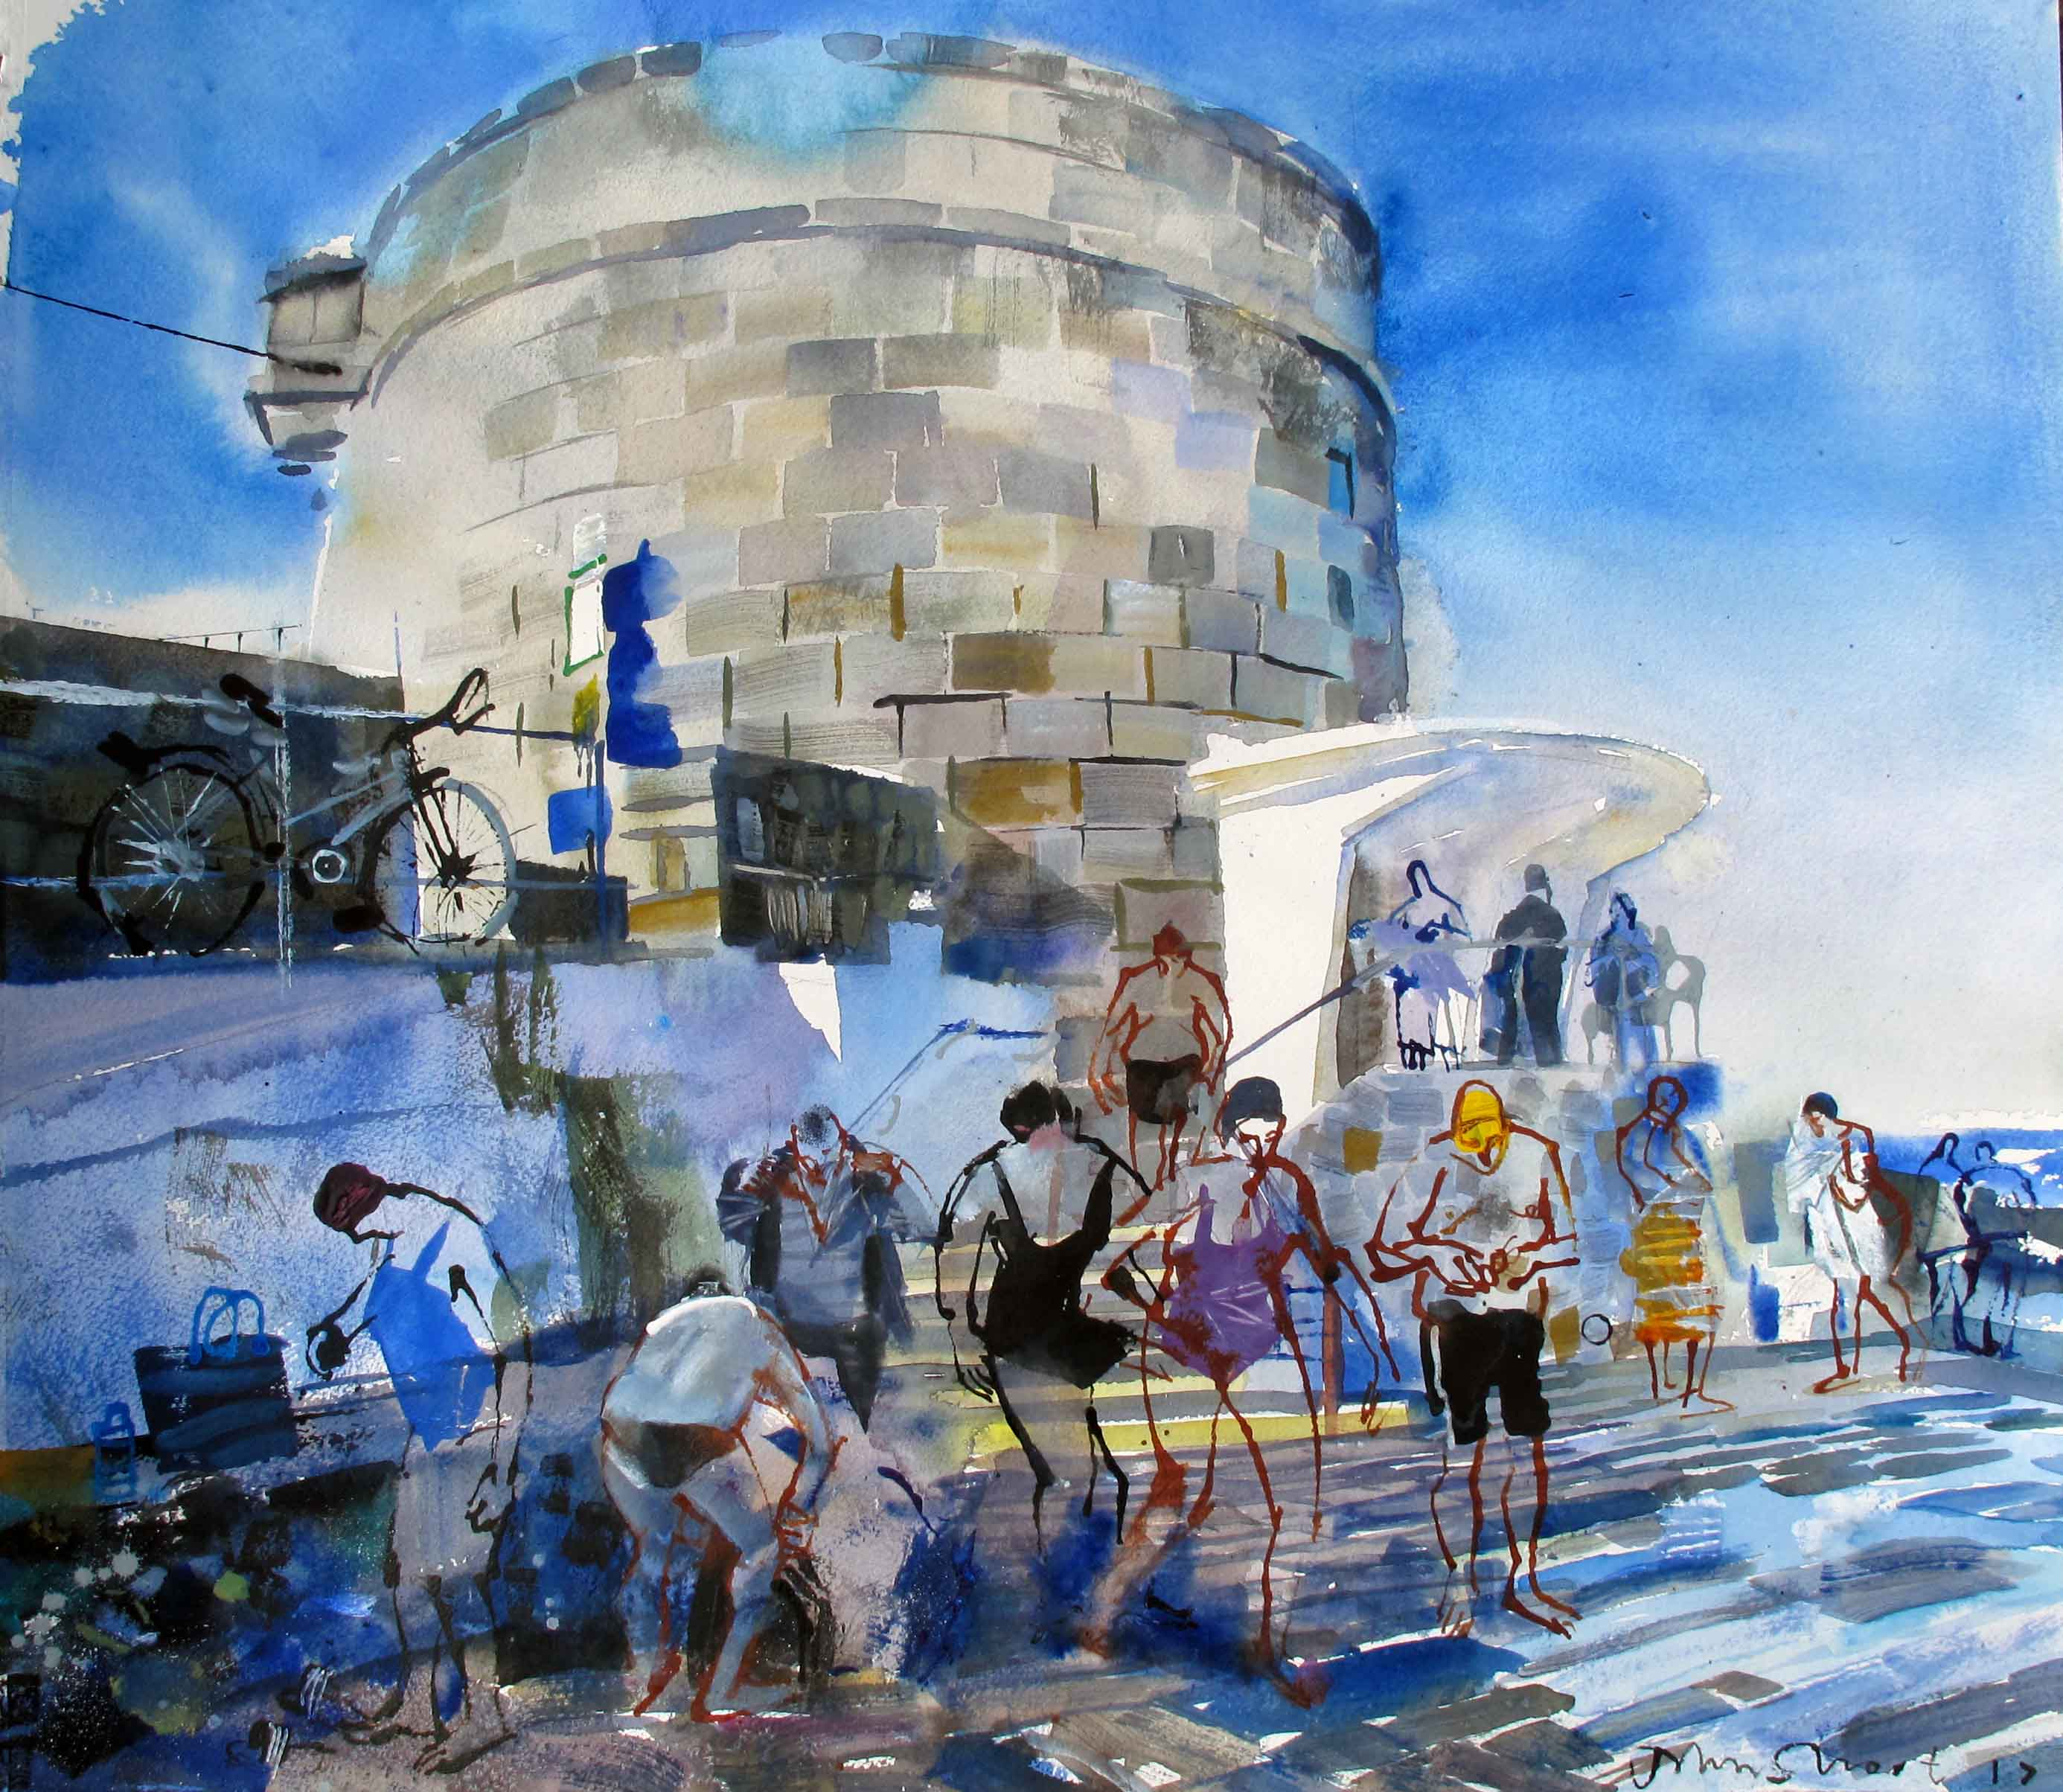 John Short, Winter Bathers, Seapoint, Co.Dublin, watercolour & ink, 41 x 66 cm